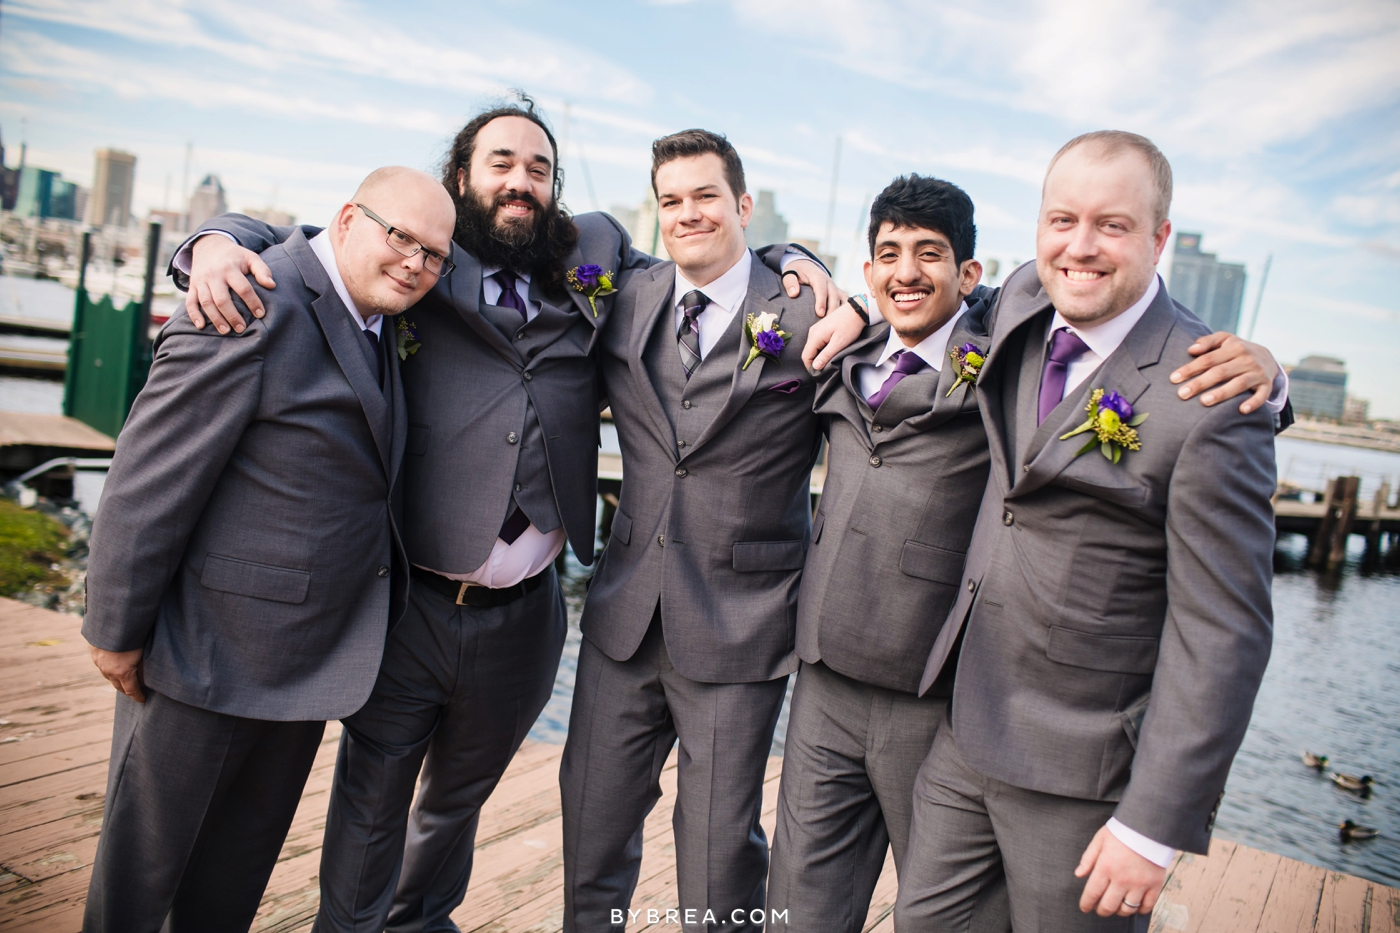 Baltimore wedding photo groom and groomsmen